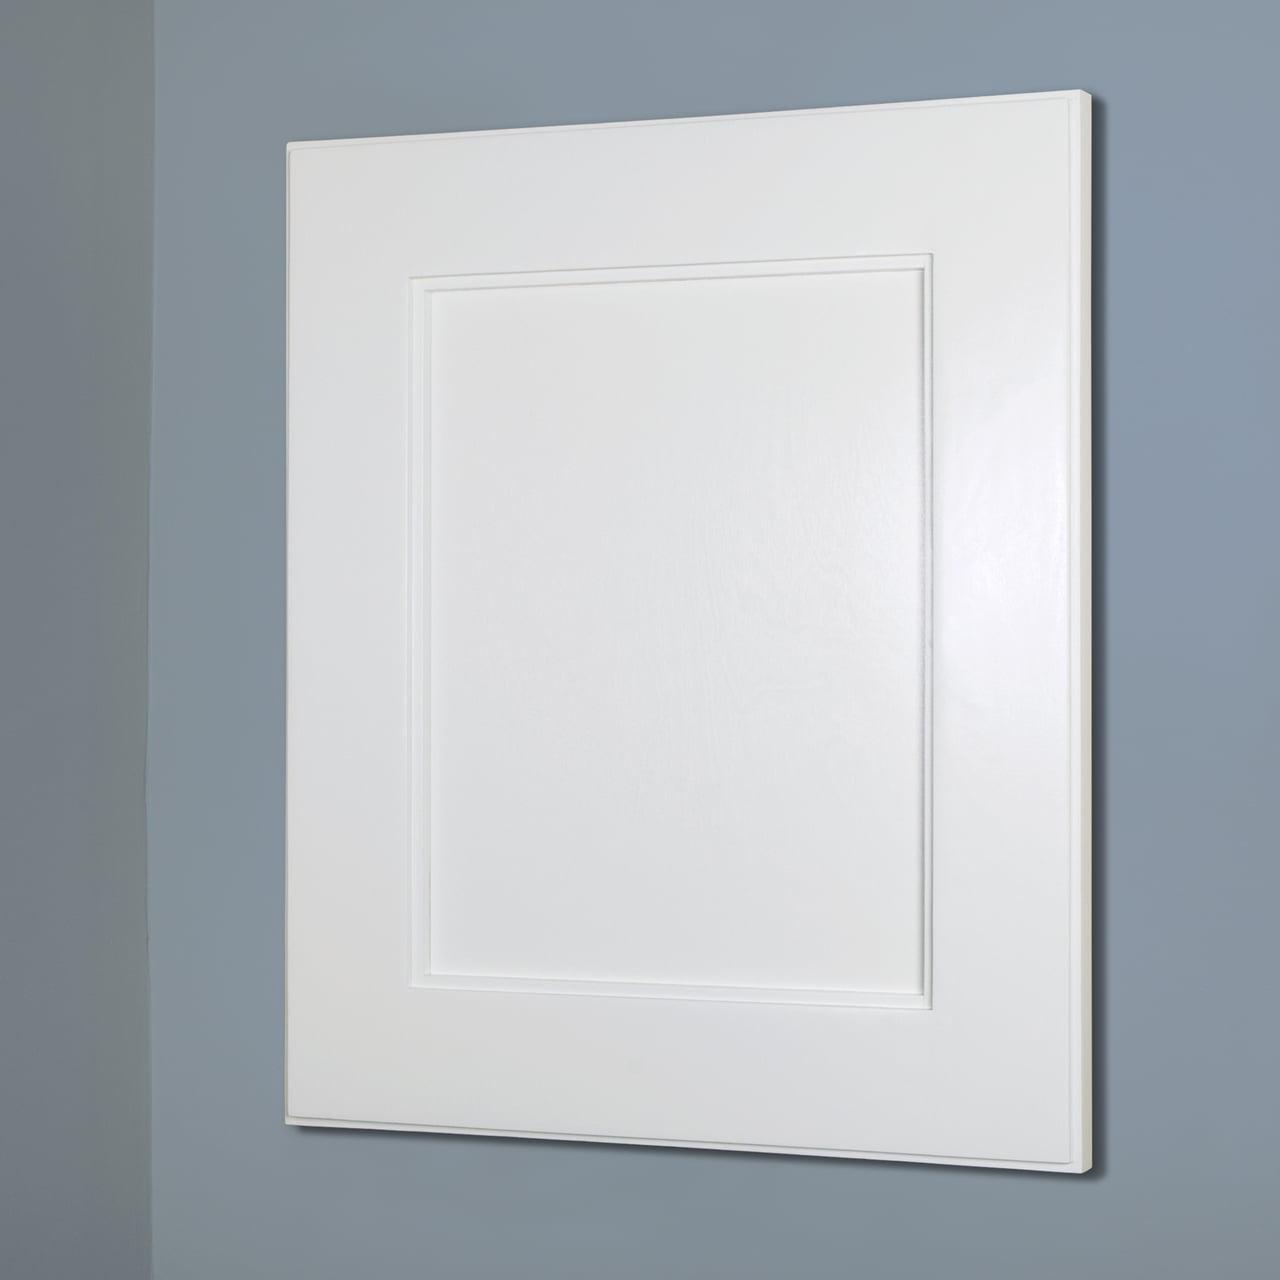 14x18 White Shaker Style Recessed Medicine Cabinet With No Mirror Walmart Com Walmart Com